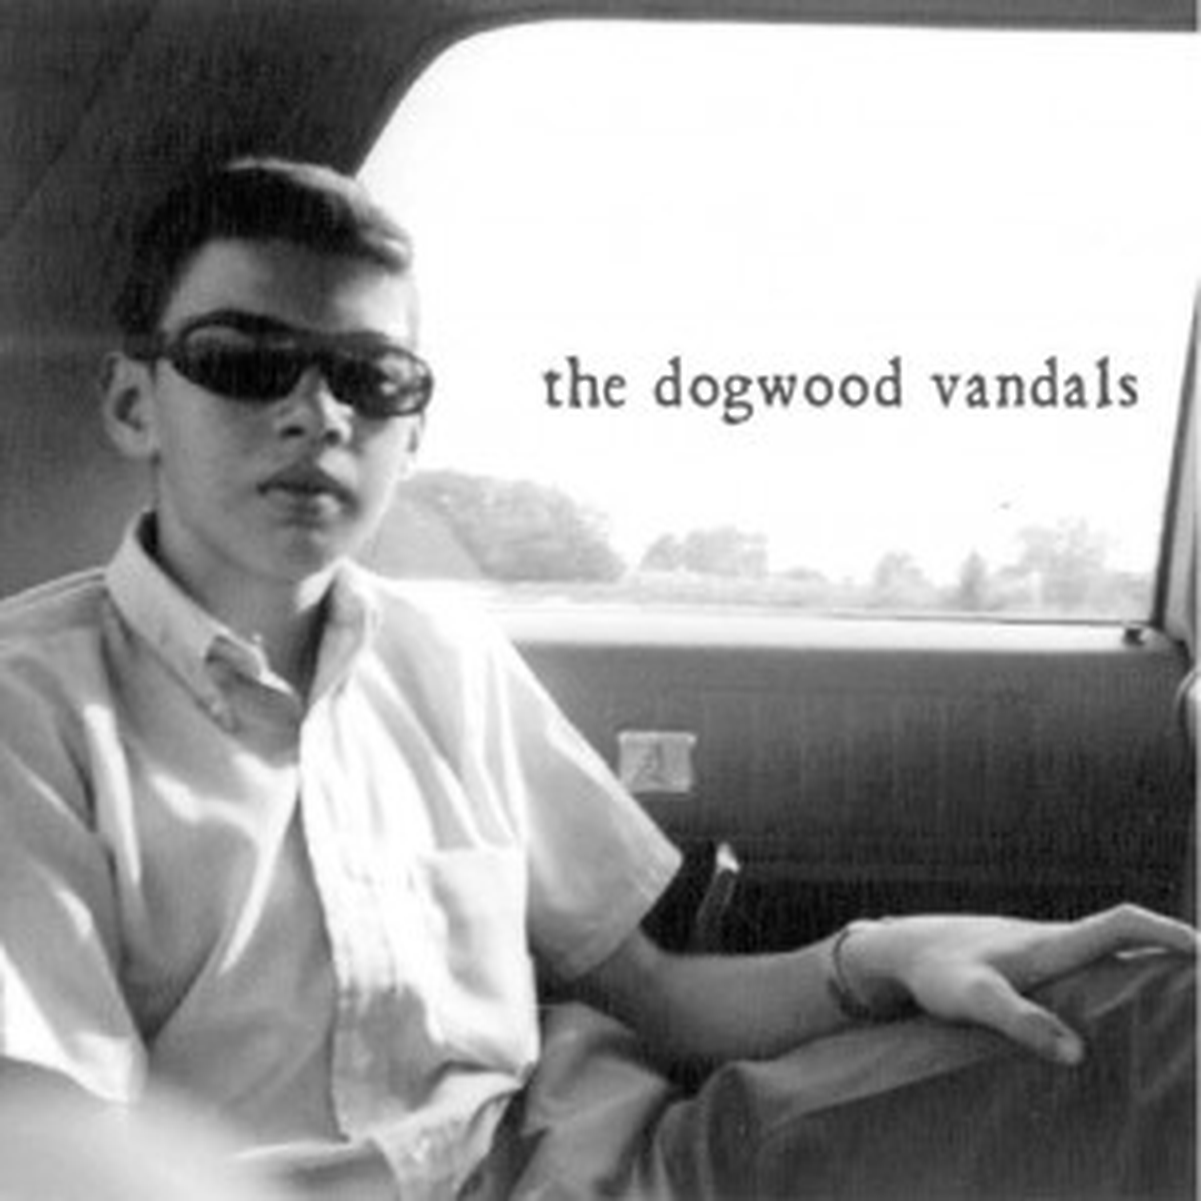 The Dogwood Vandals